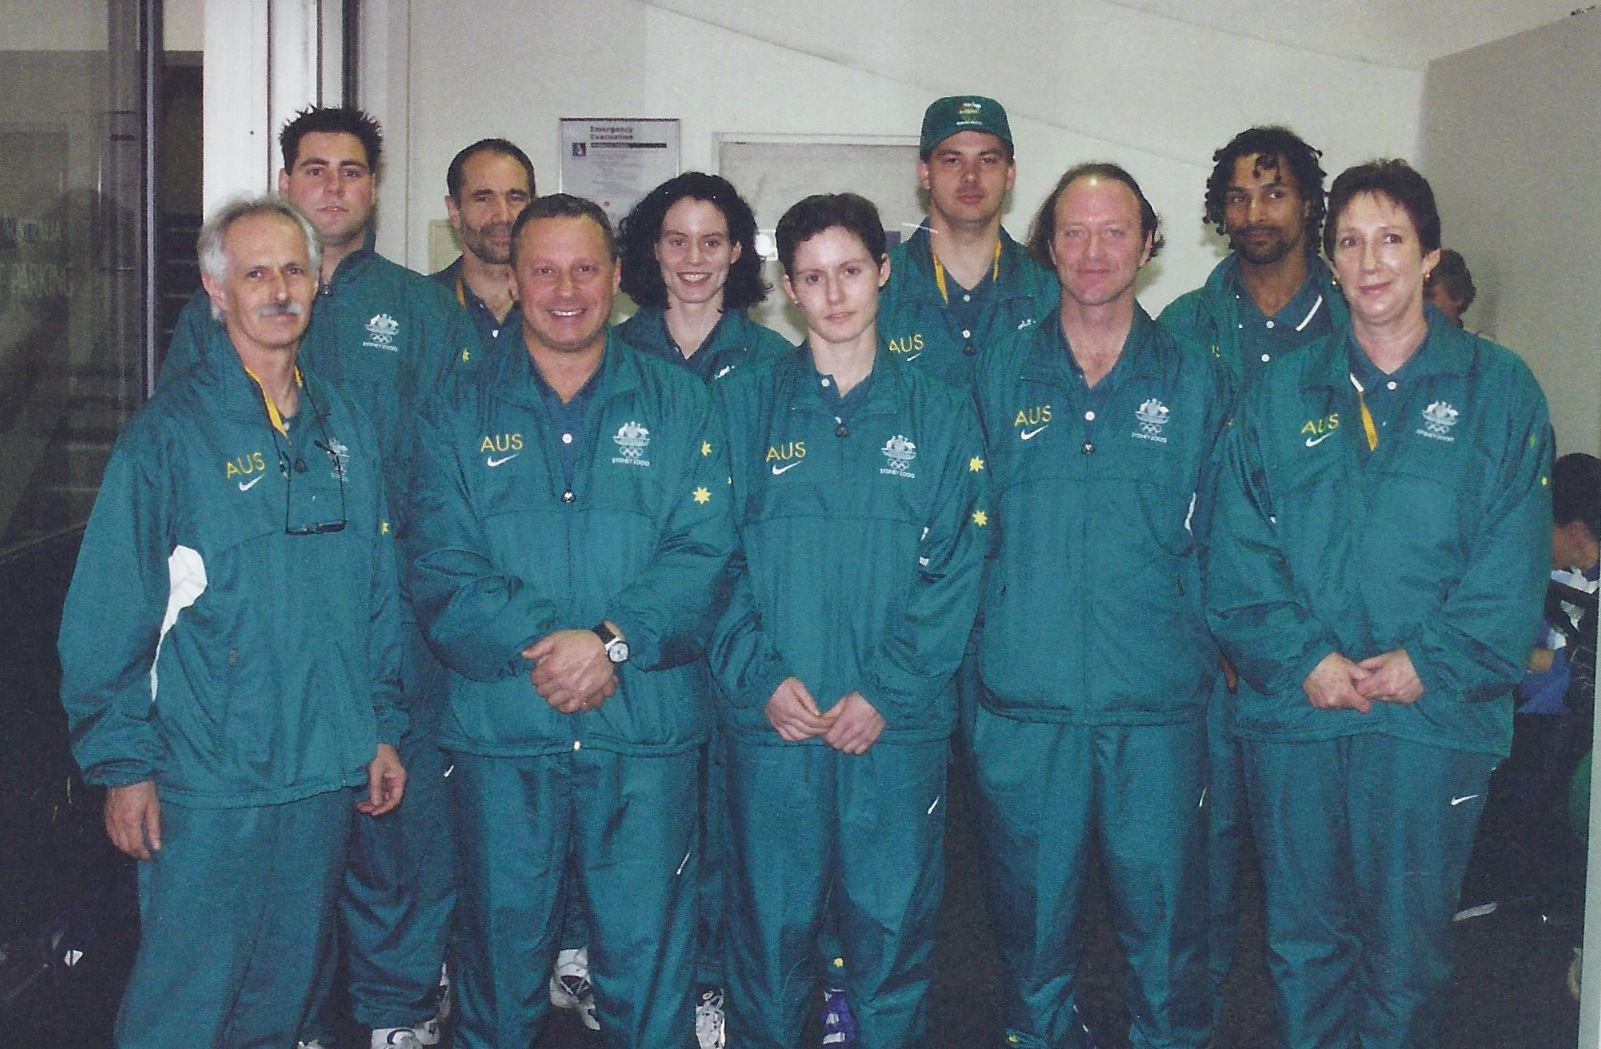 Sydney 2000 Olympics Australian Fencing Team